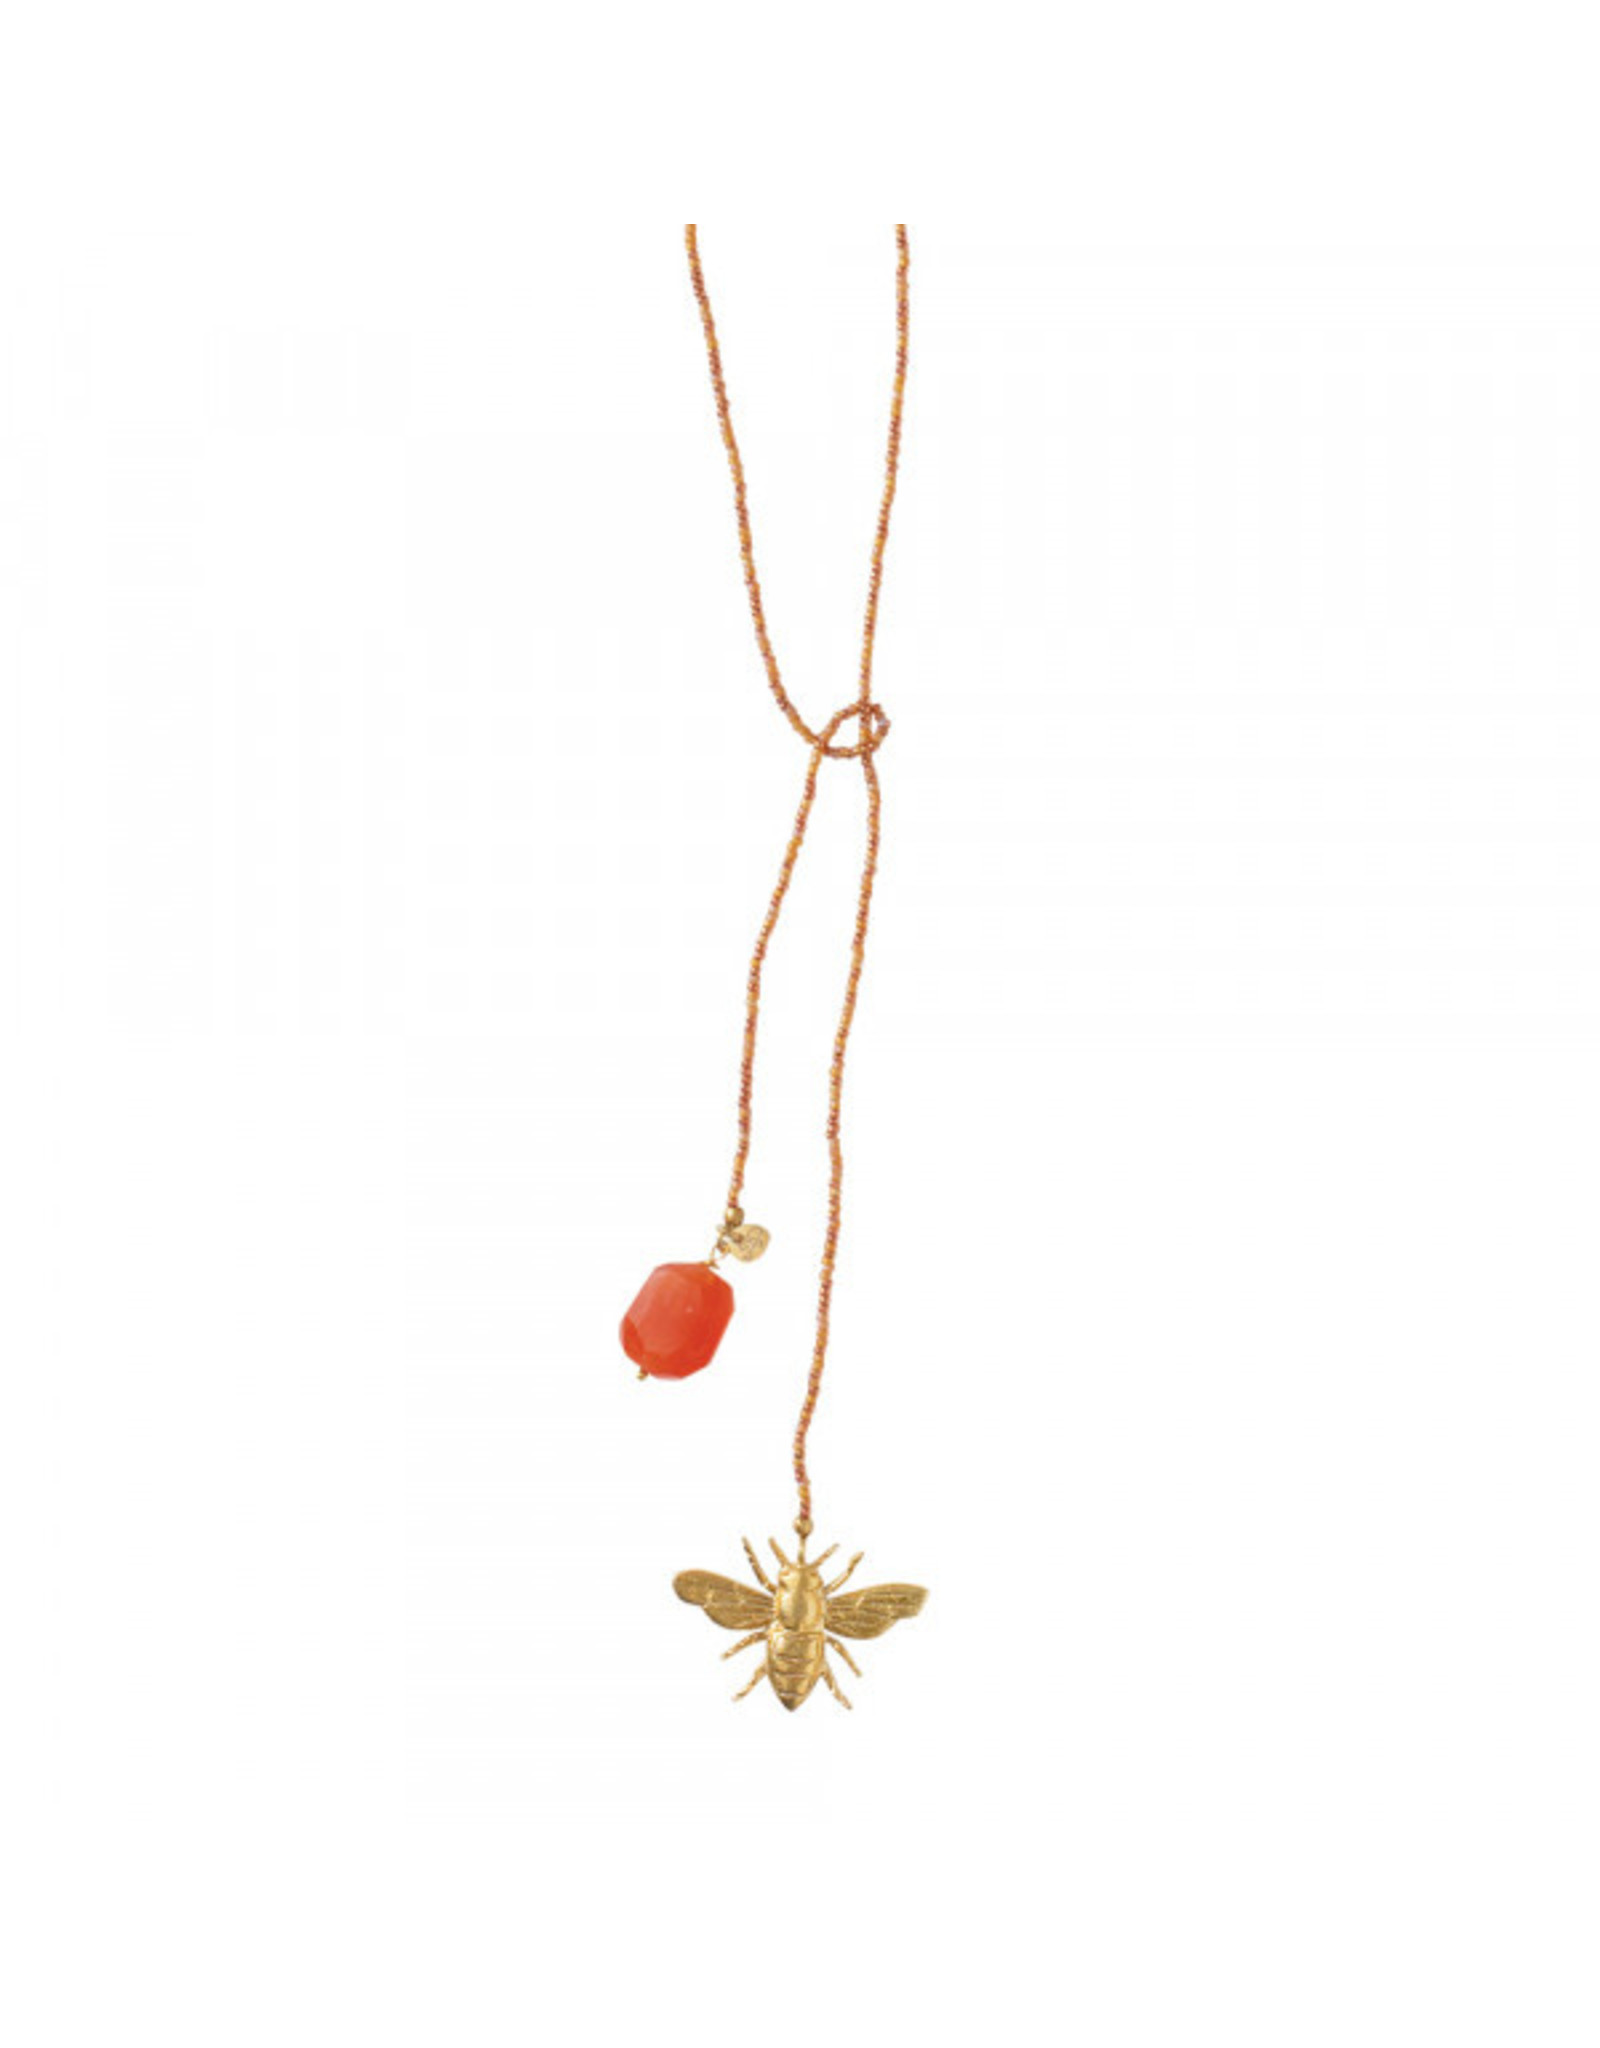 A beautiful Story Nova Carnelian Gold Necklace